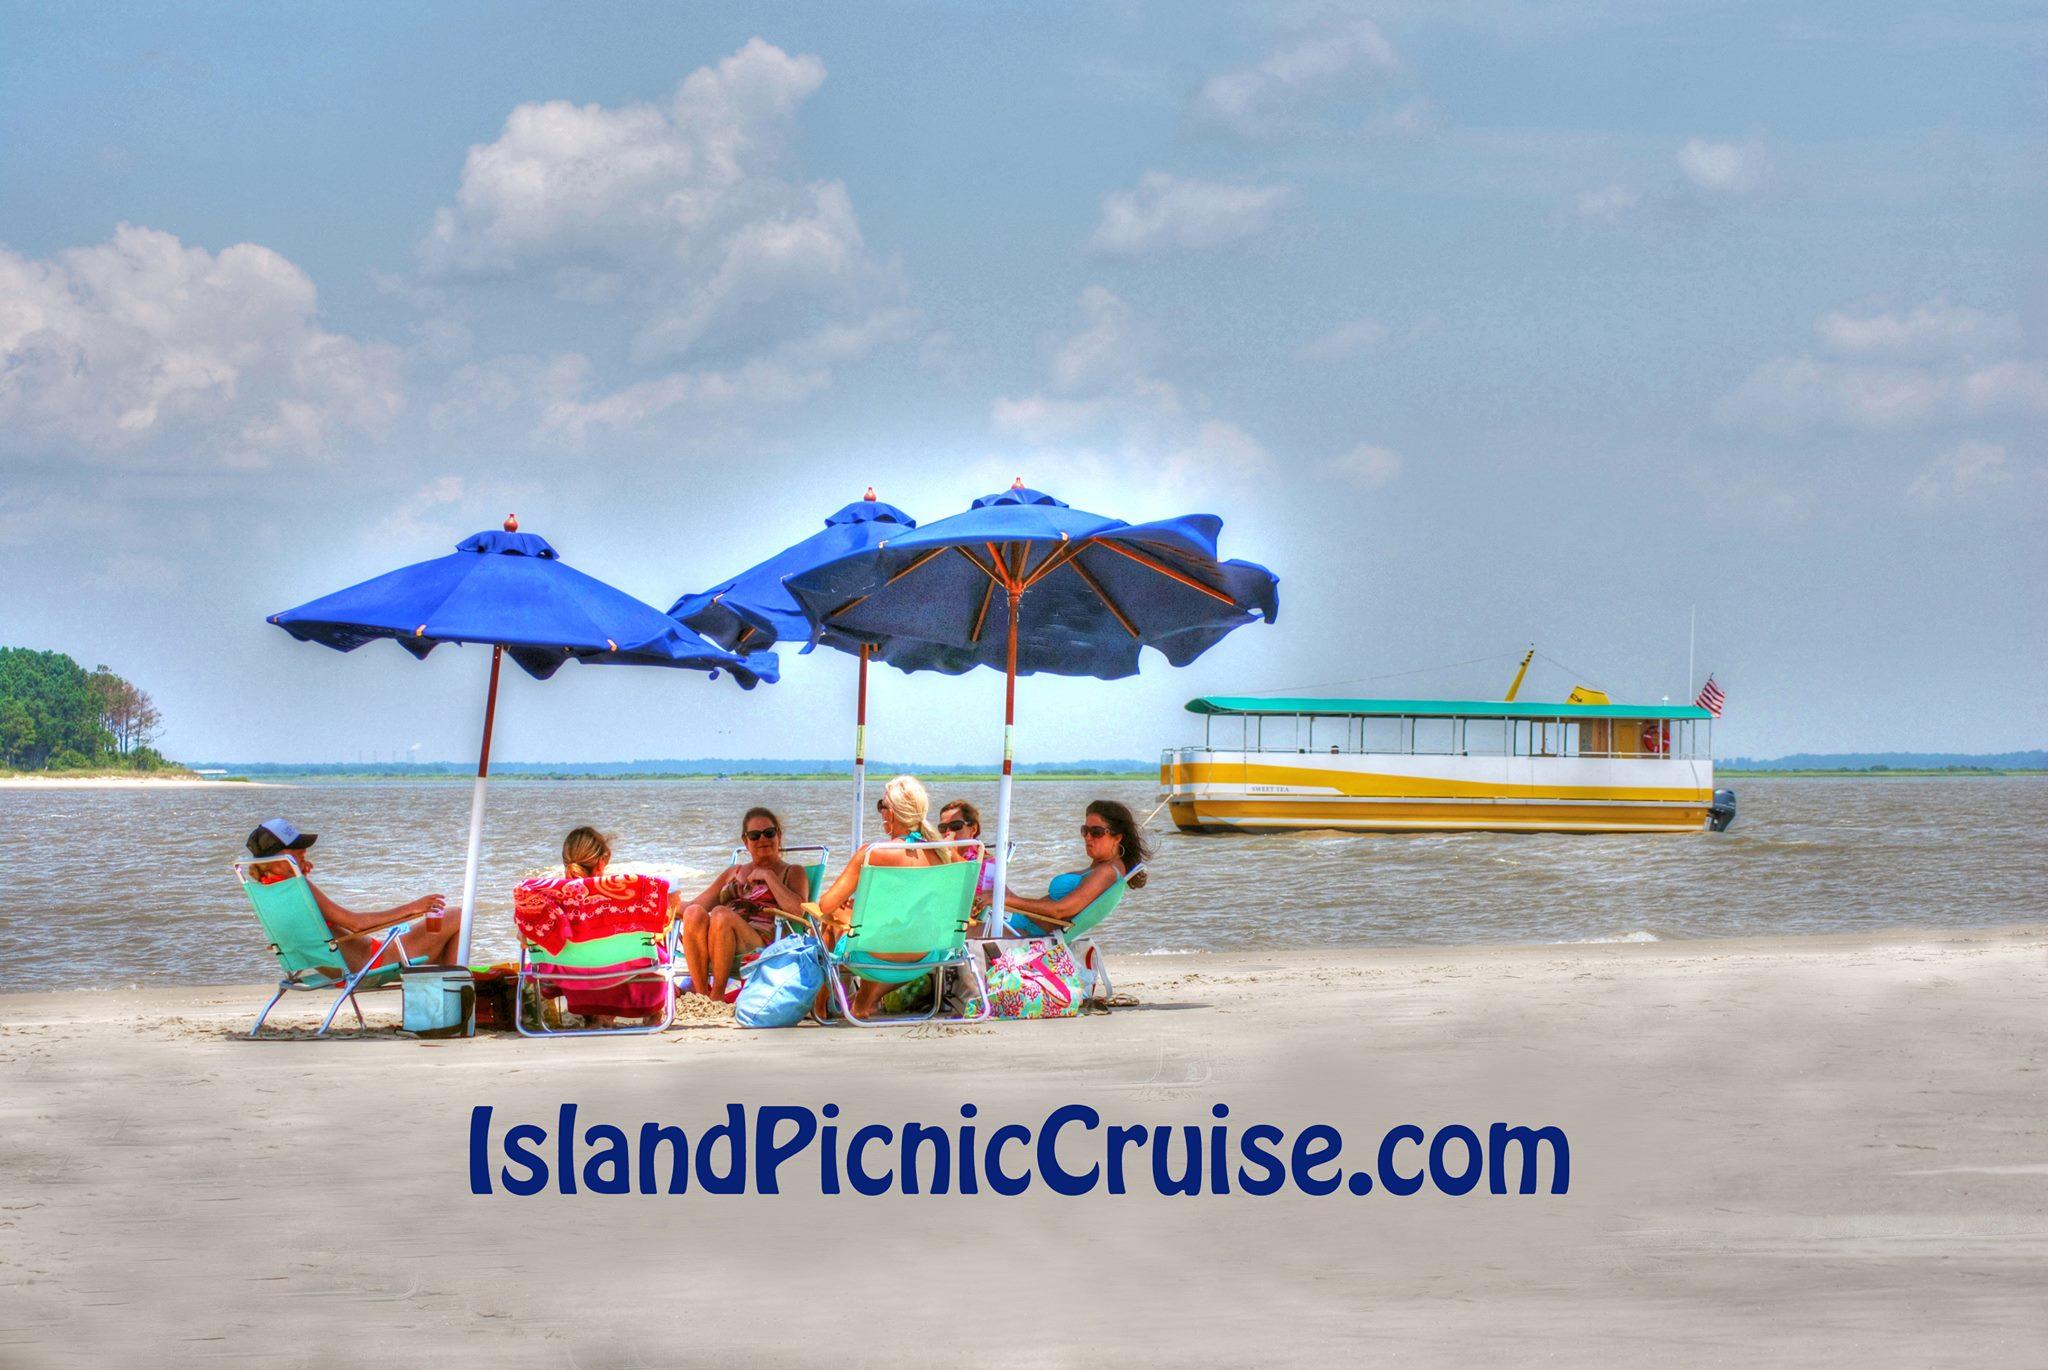 Island Picnic Cruise pic.jpg